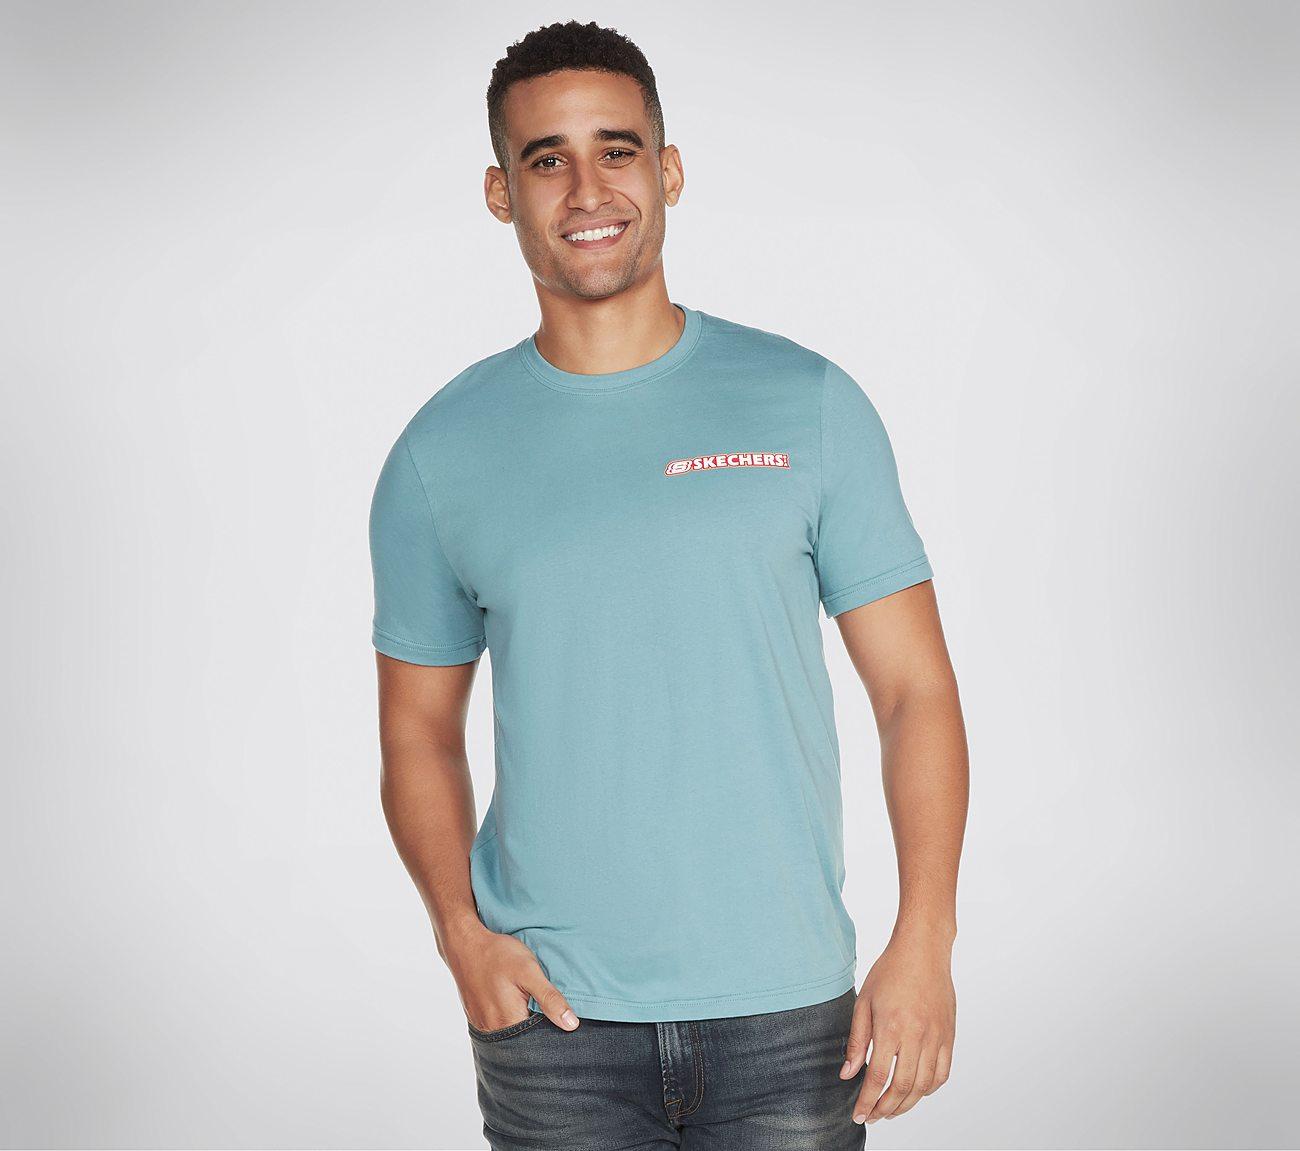 Skechers Apparel S In Fun Tee Shirt